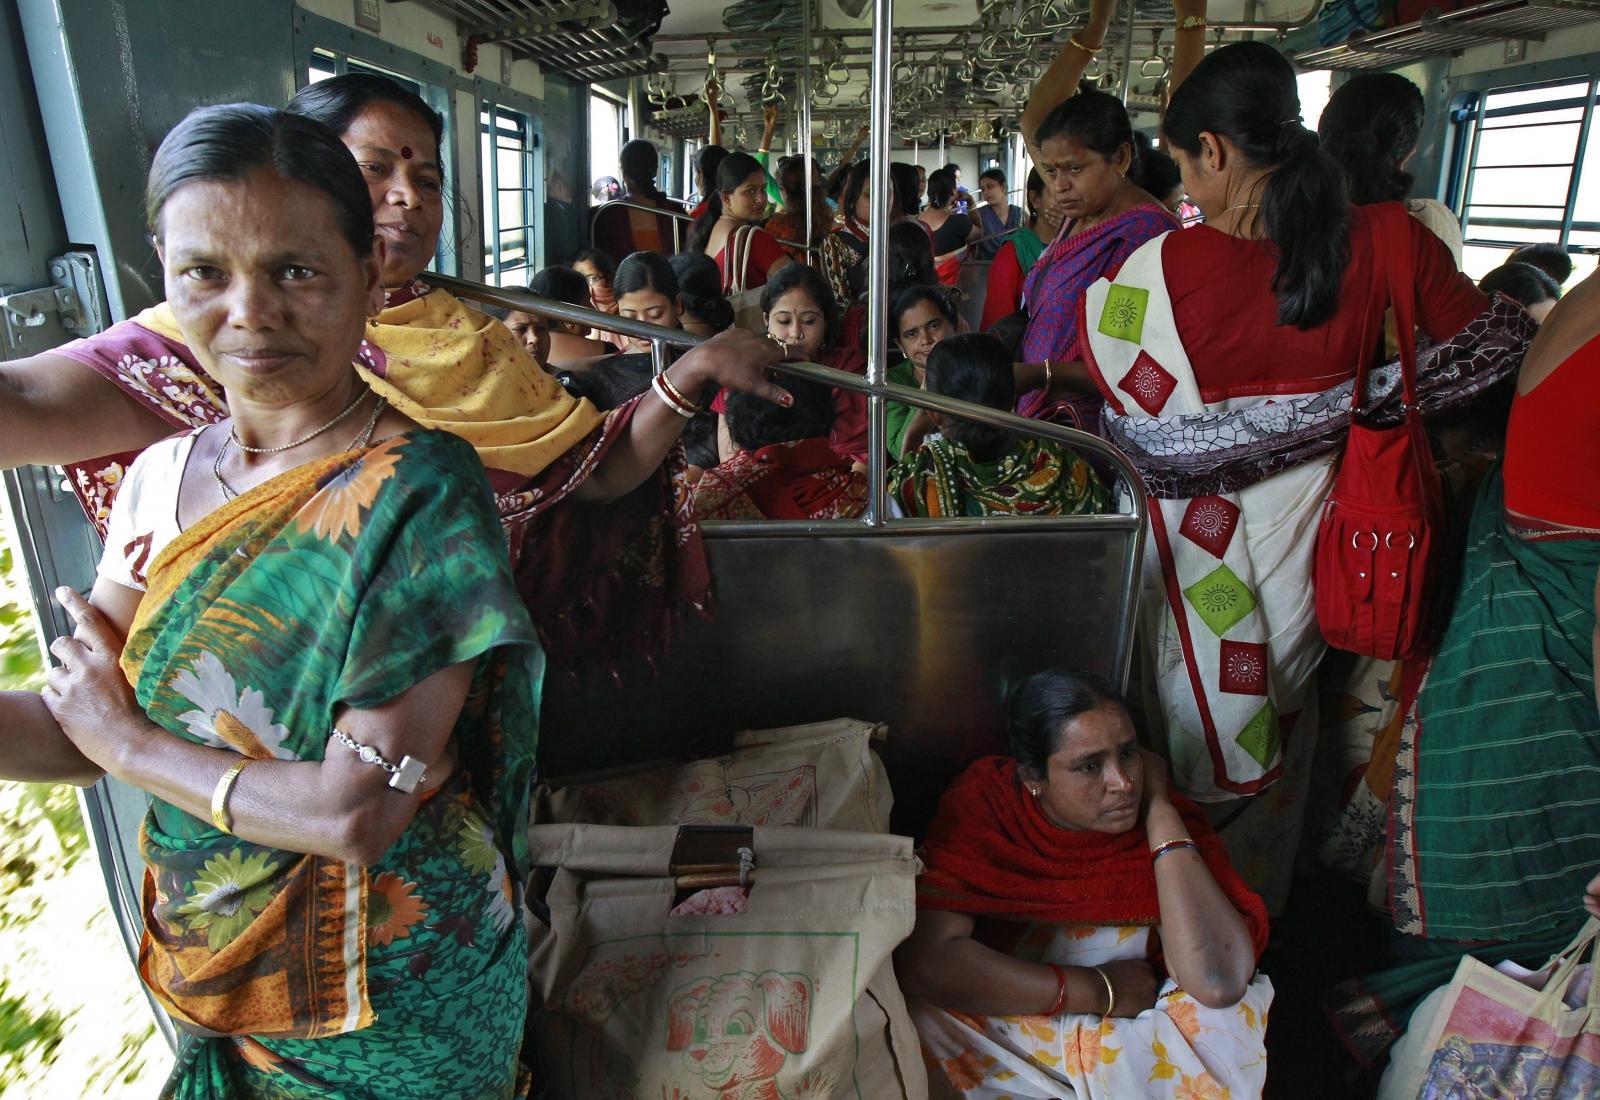 Women Groping Men On Bus